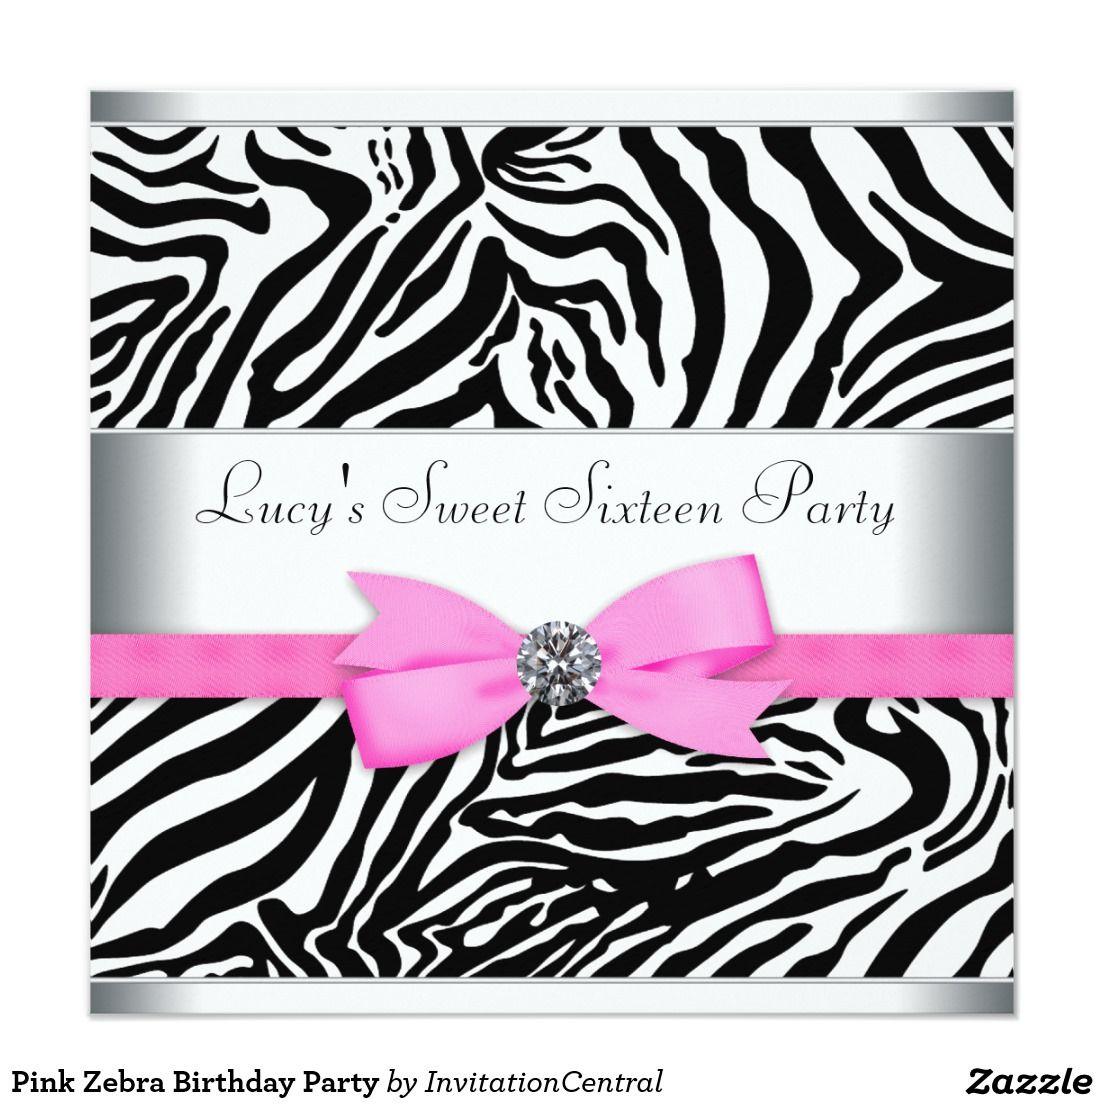 Pink Zebra Birthday Party Card